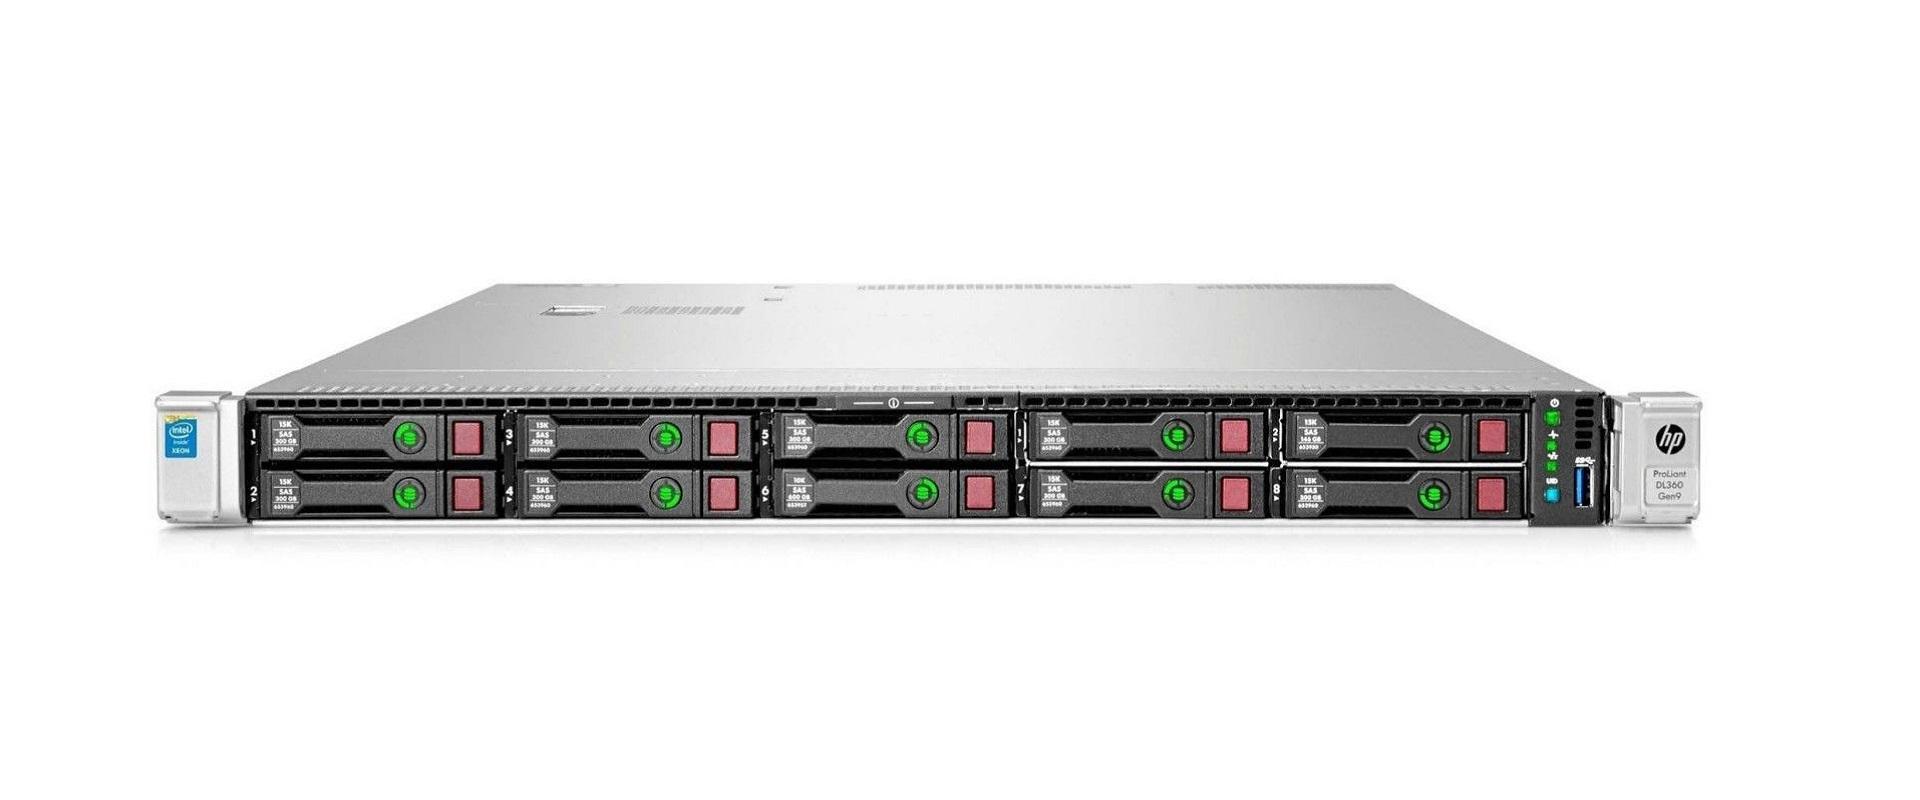 HP ProLiant DL360 G9 server